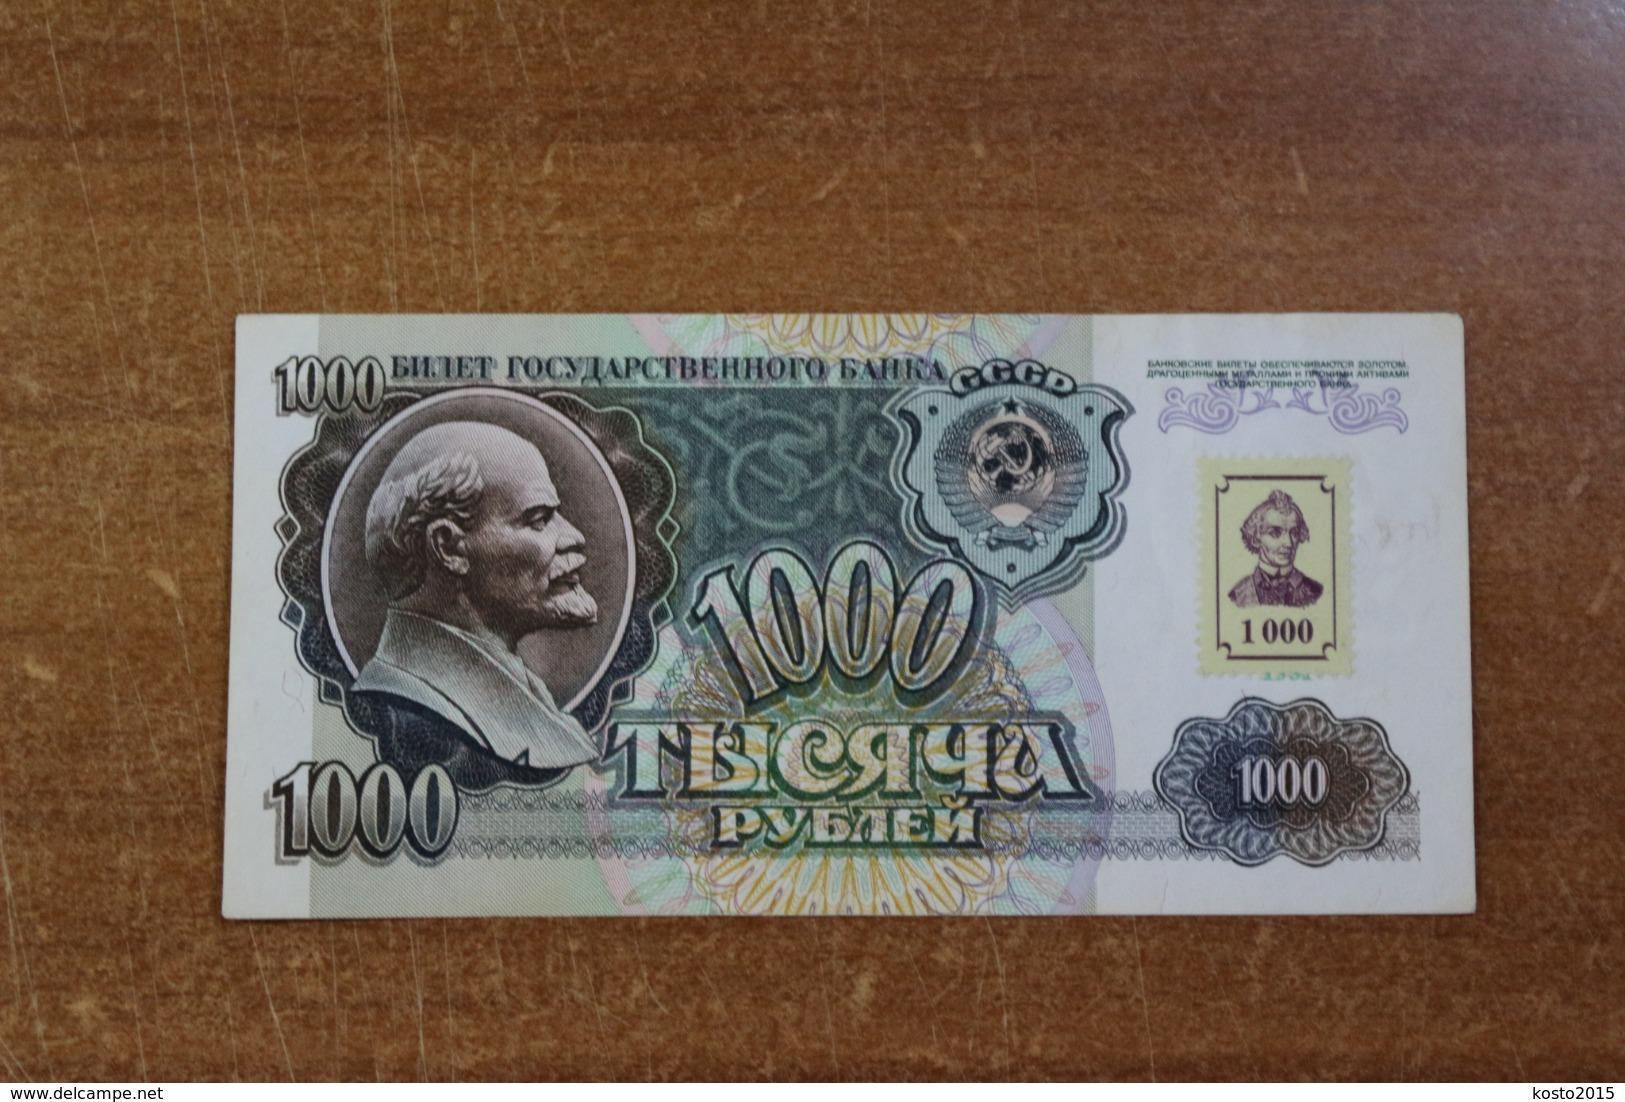 Transnistria 1000 Rubles 1992 - Banknotes